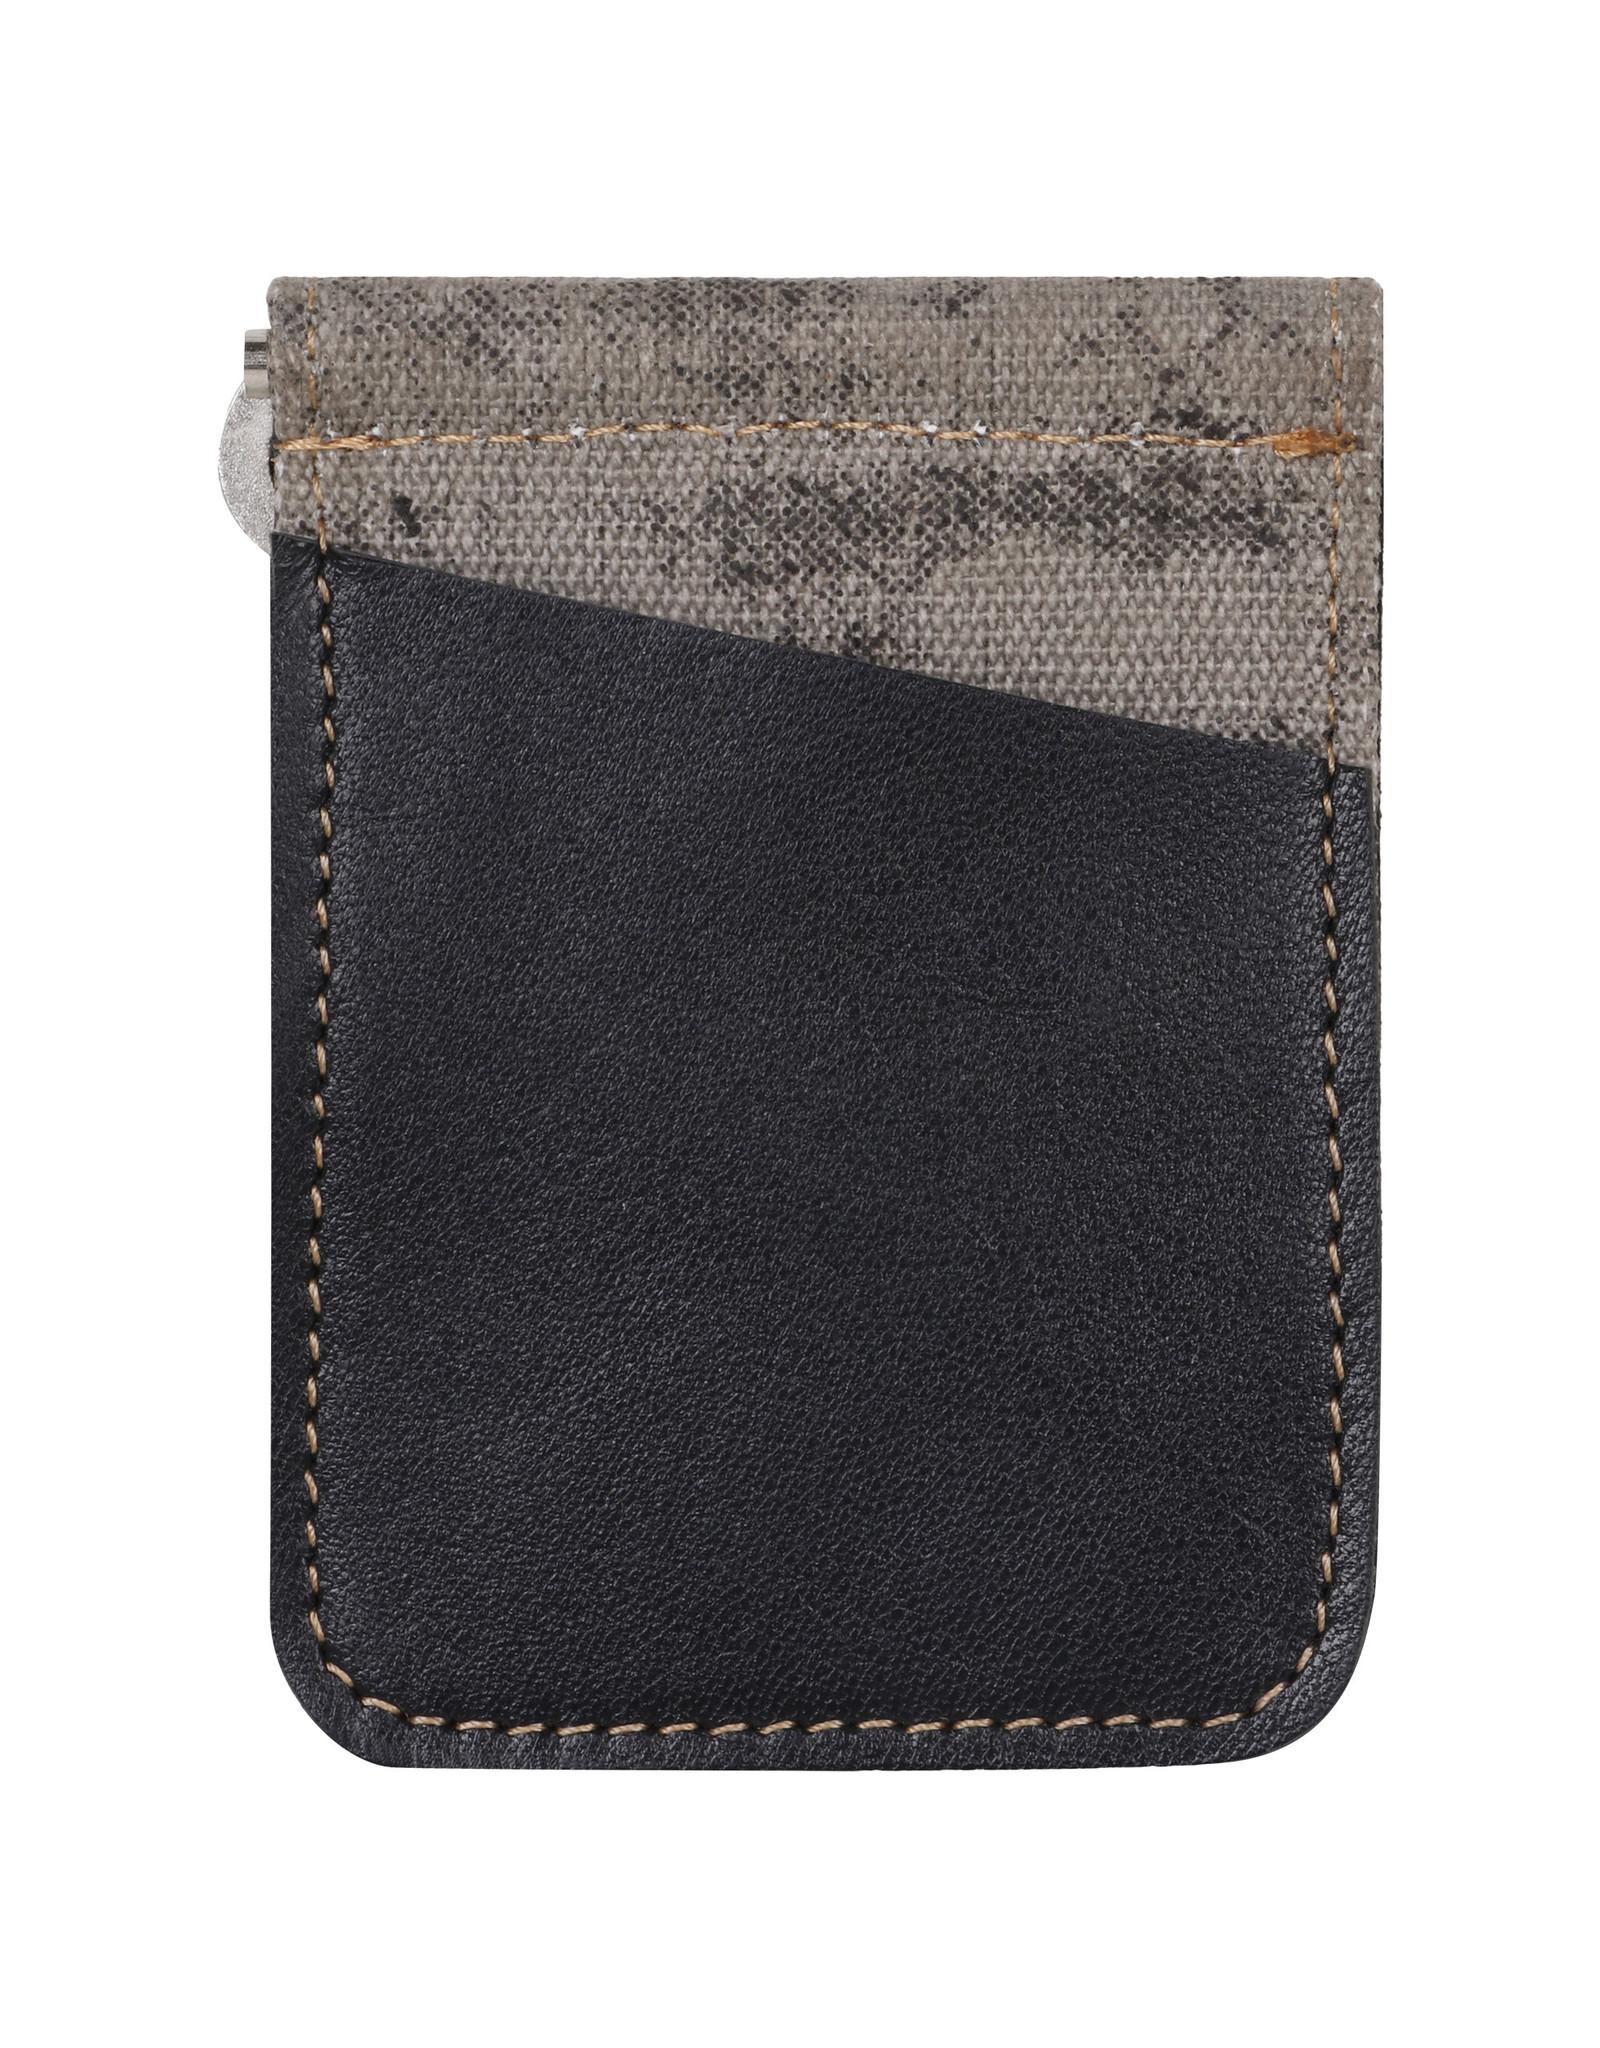 Vann & Co VG1026-P7 RFID Money Clip